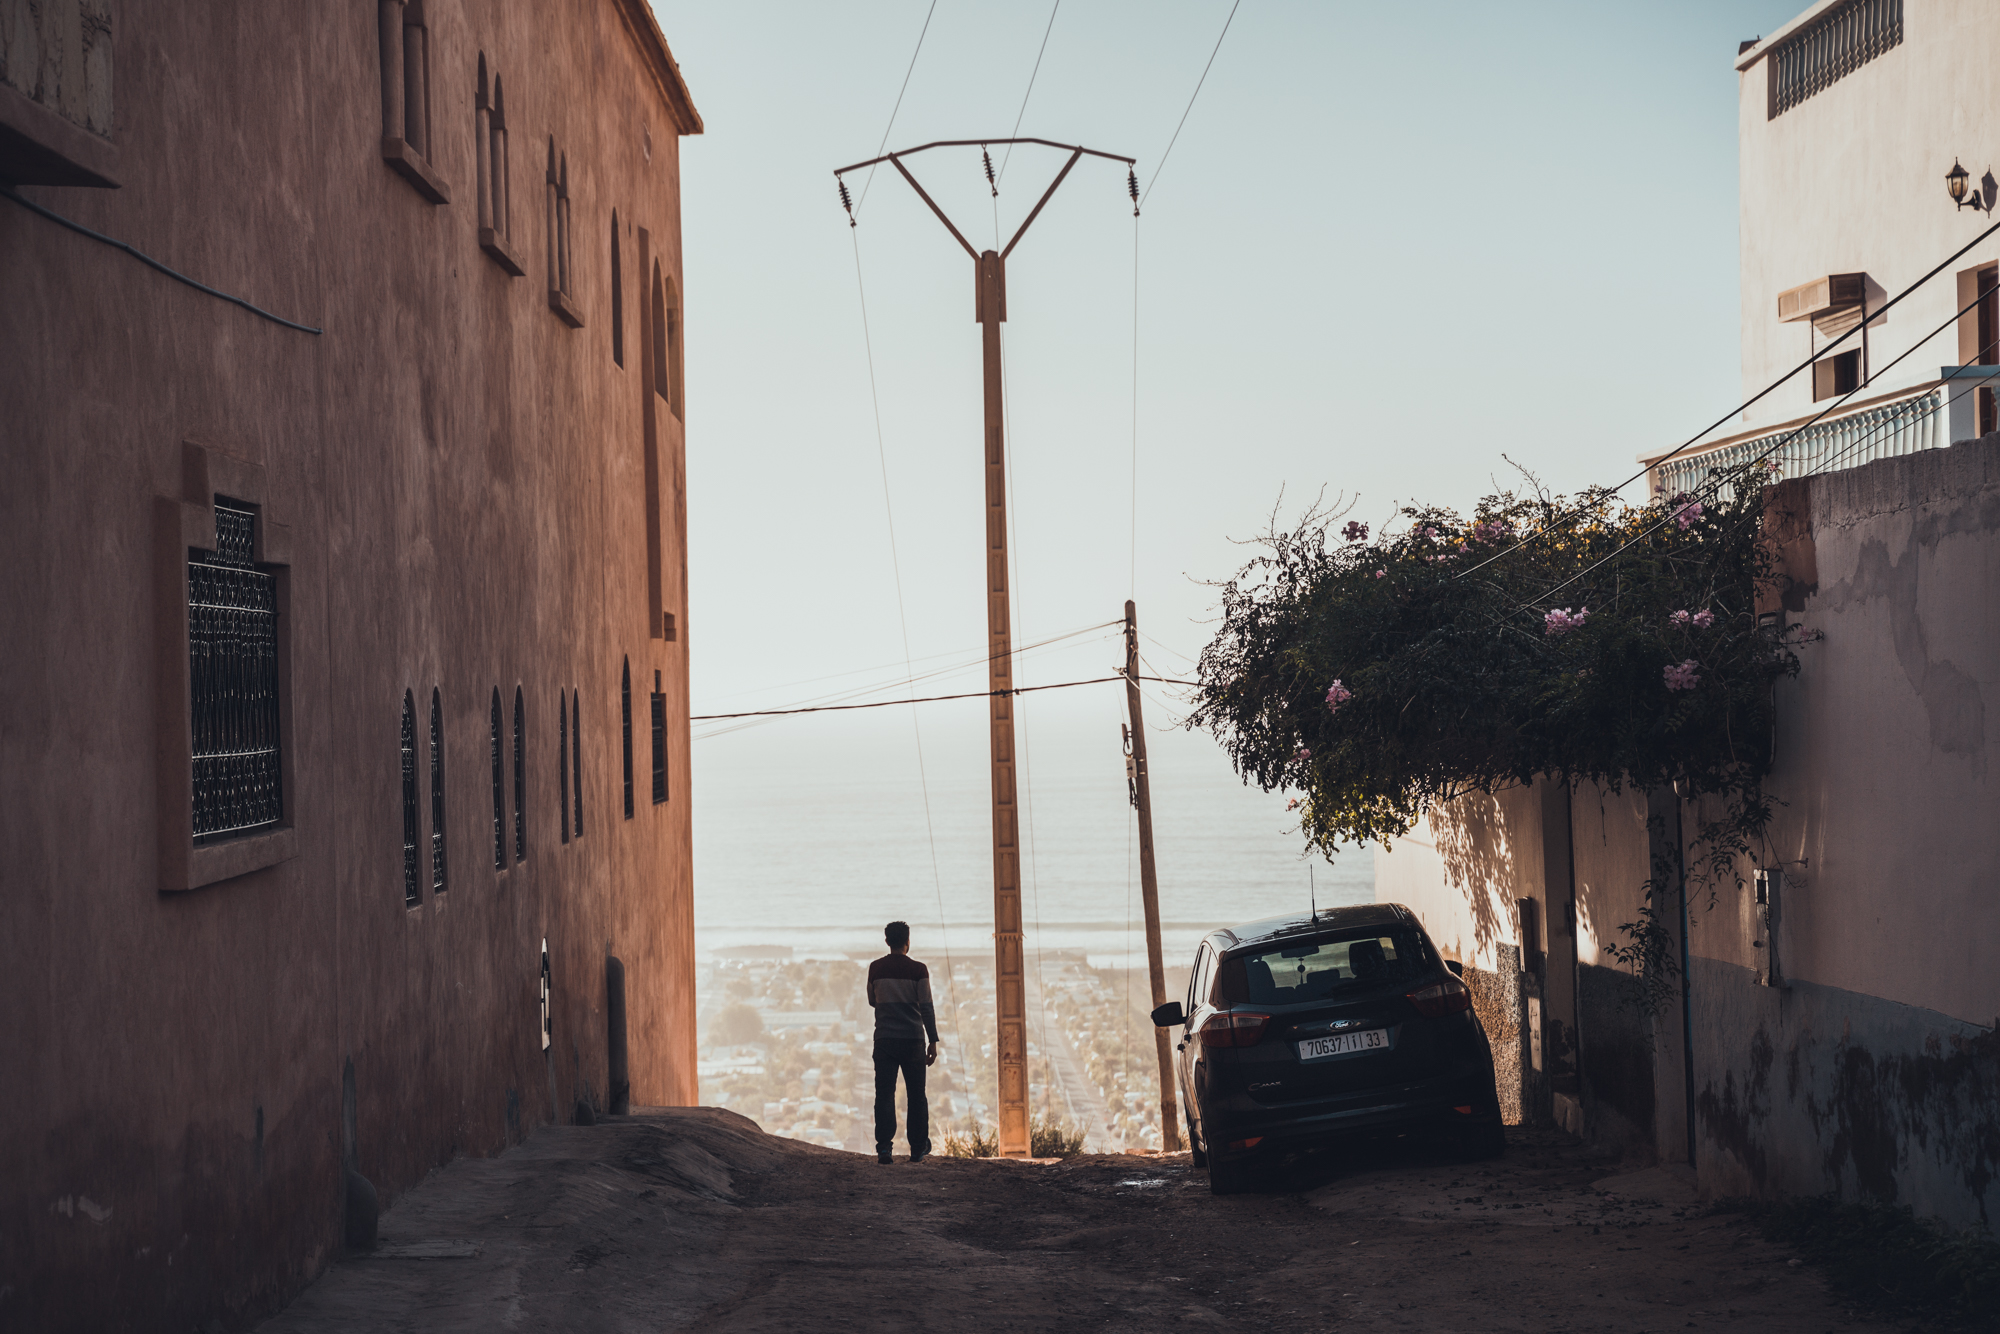 StijnHoekstra_Marocco-22.jpg